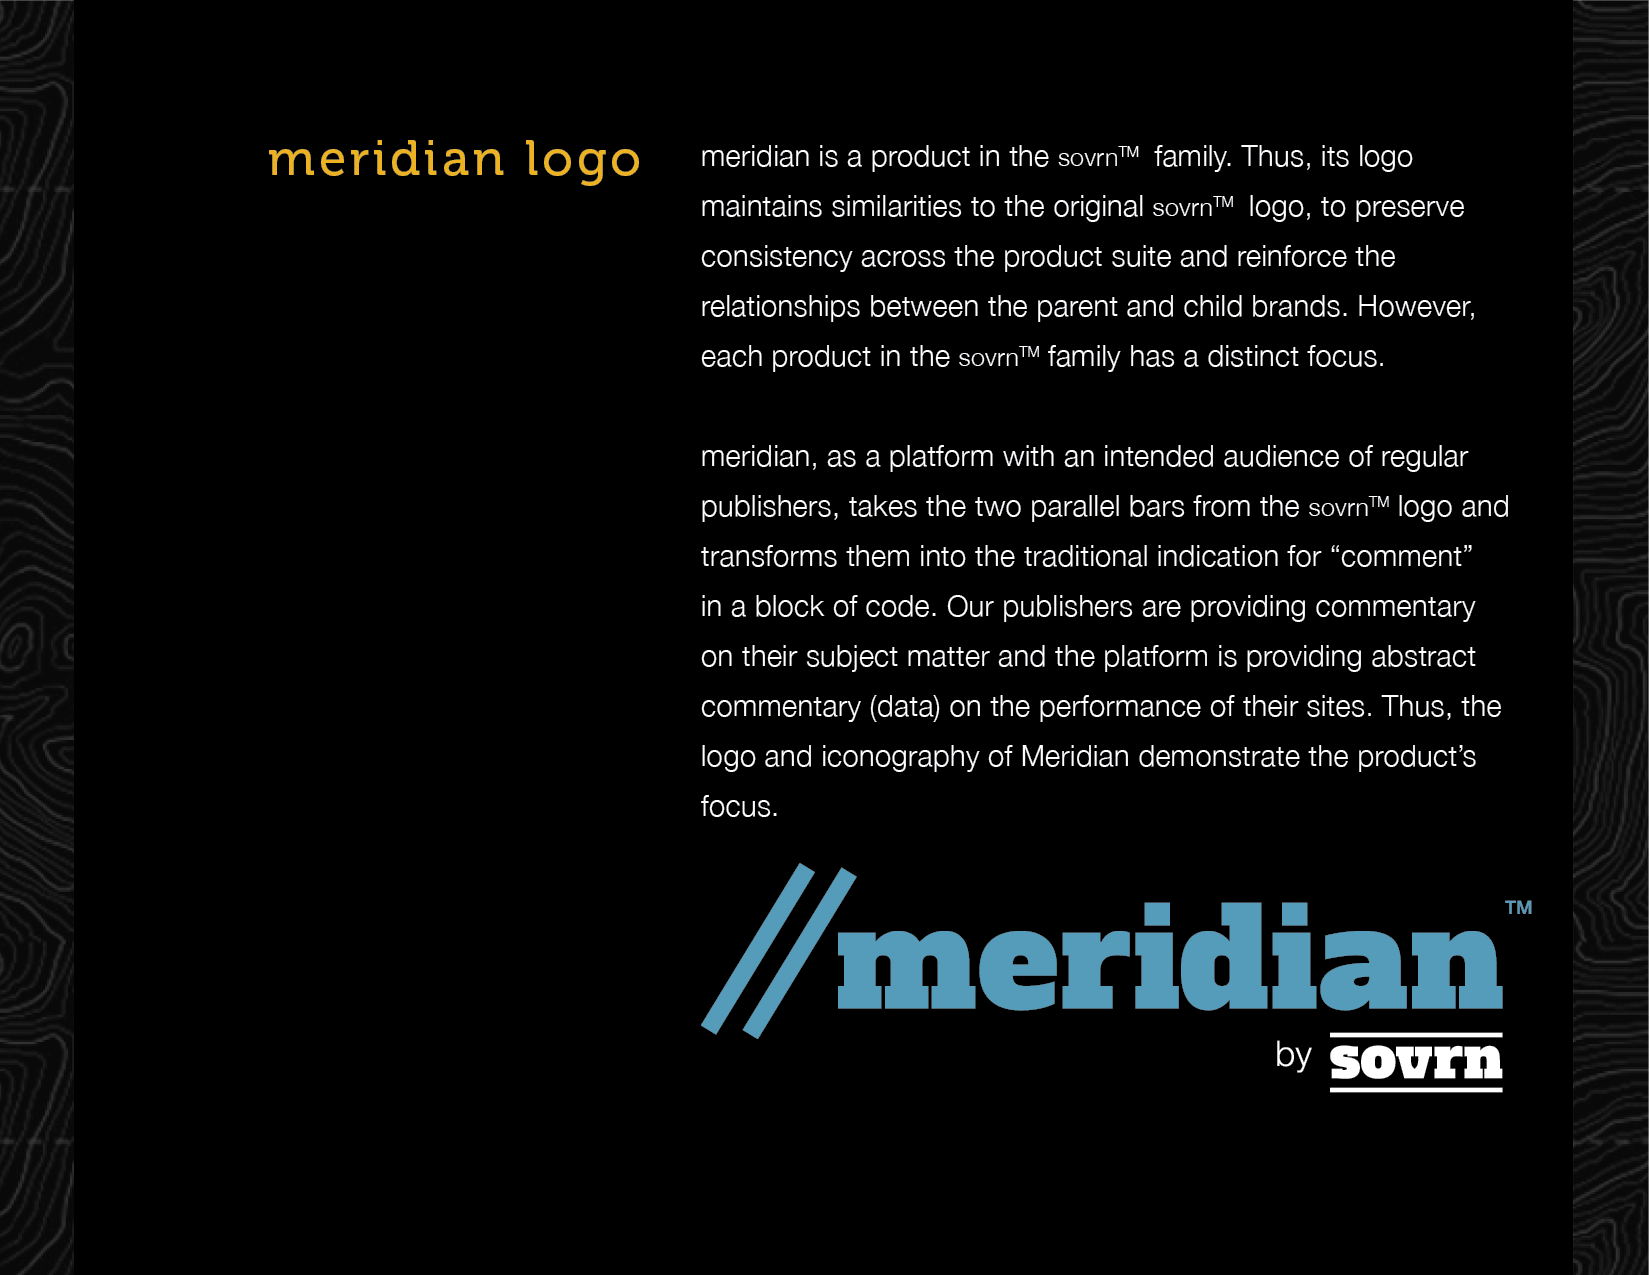 meridian_color_palette32.png